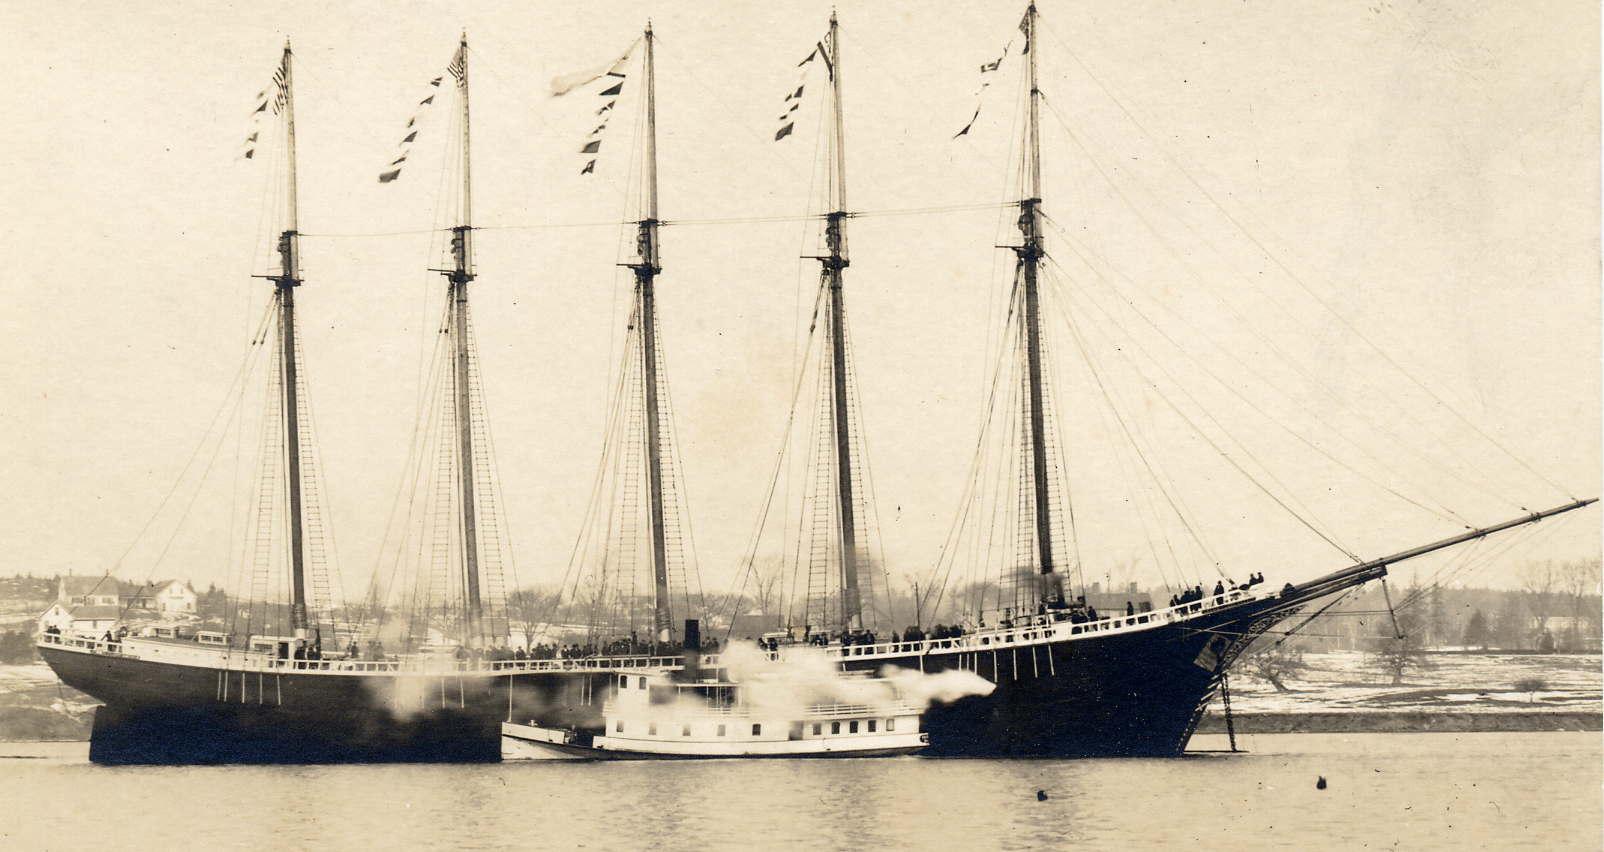 5 Mast Ship Jenny F Kreger